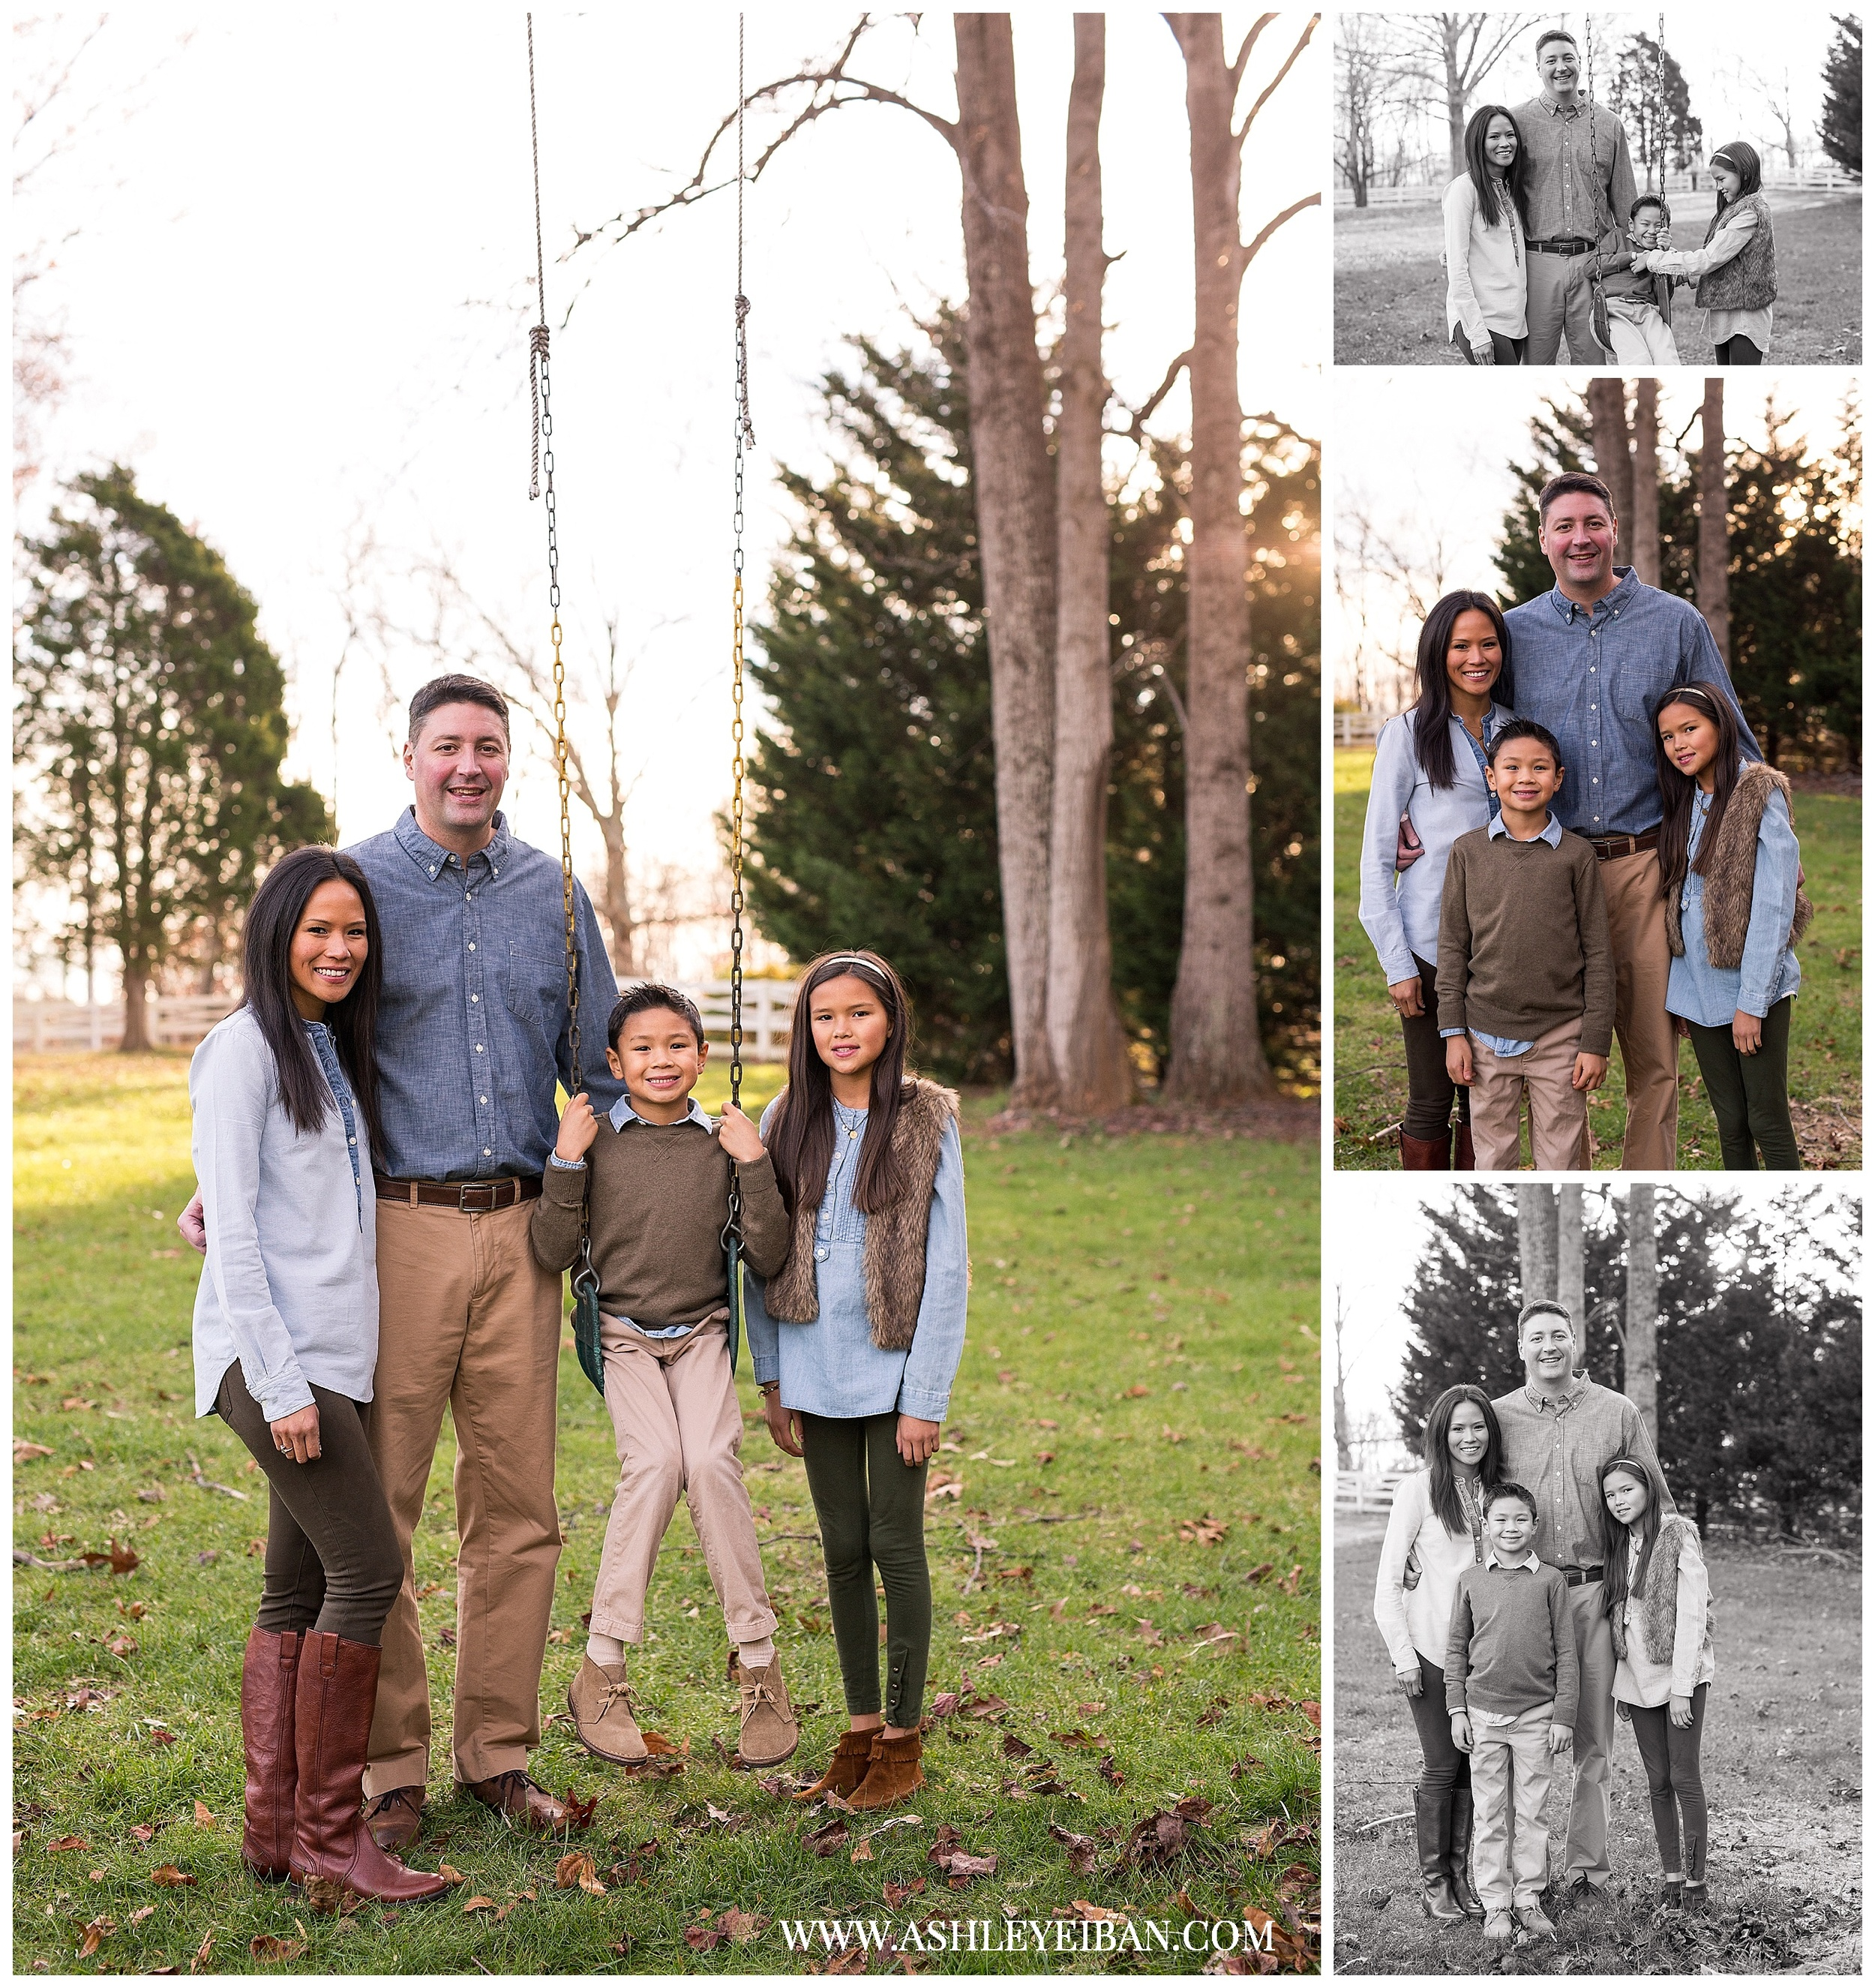 Lynchburg VA Wedding & Portrait Photographer    Lynchburg Virginia Family Photos    Ashley Eiban Photography    www.ashleyeiban.com